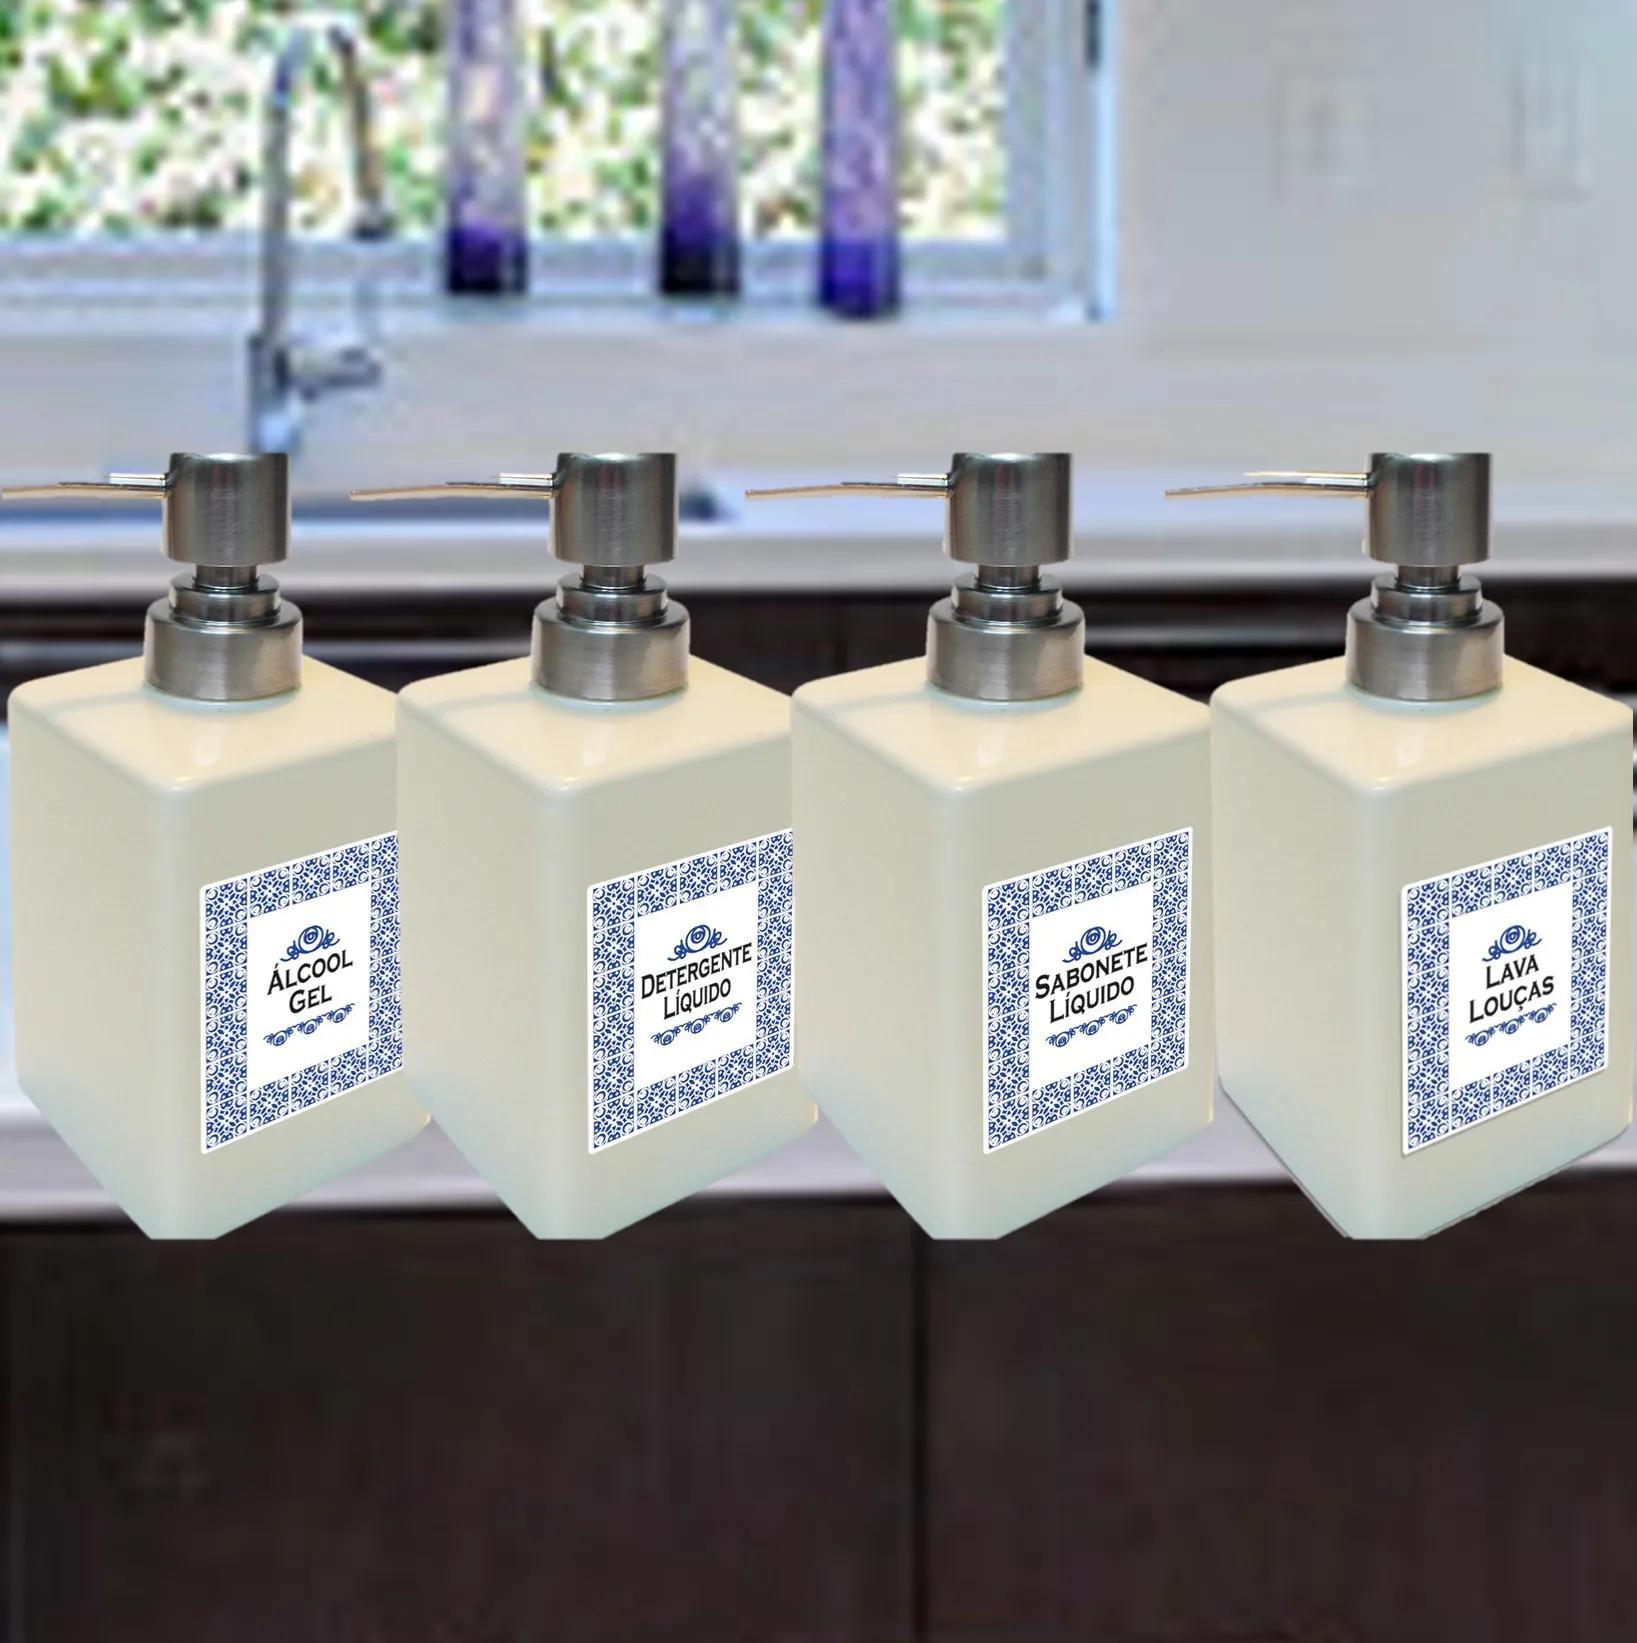 Porta ÁlcoolGel, Sabonete e Detergente líquido, Lava-Louças em porcelana